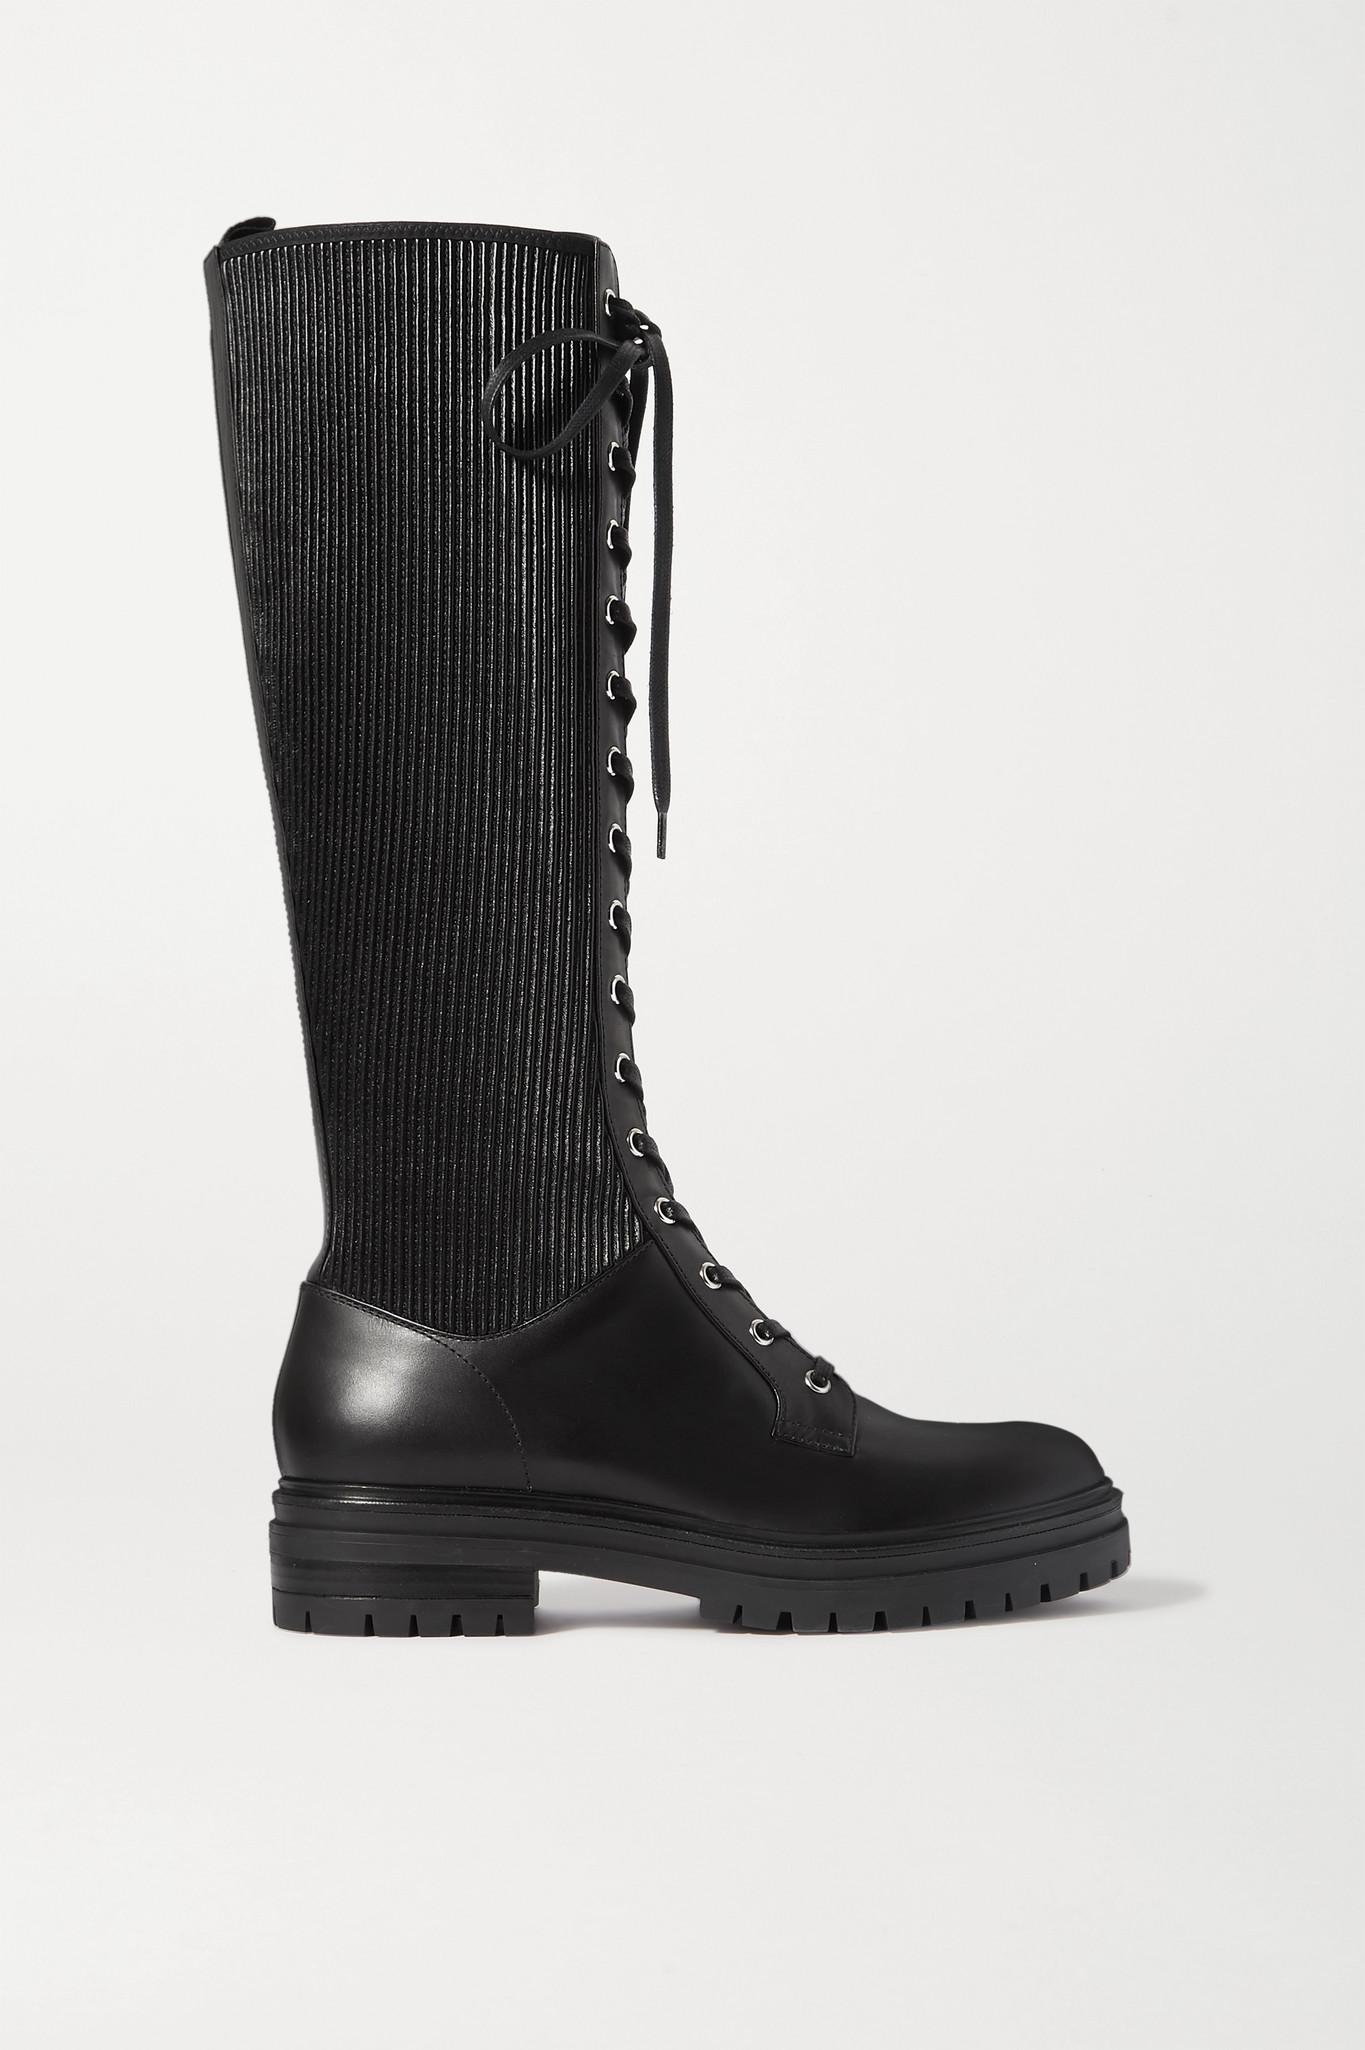 GIANVITO ROSSI - 绑带式皮革及膝长靴 - 黑色 - IT35.5